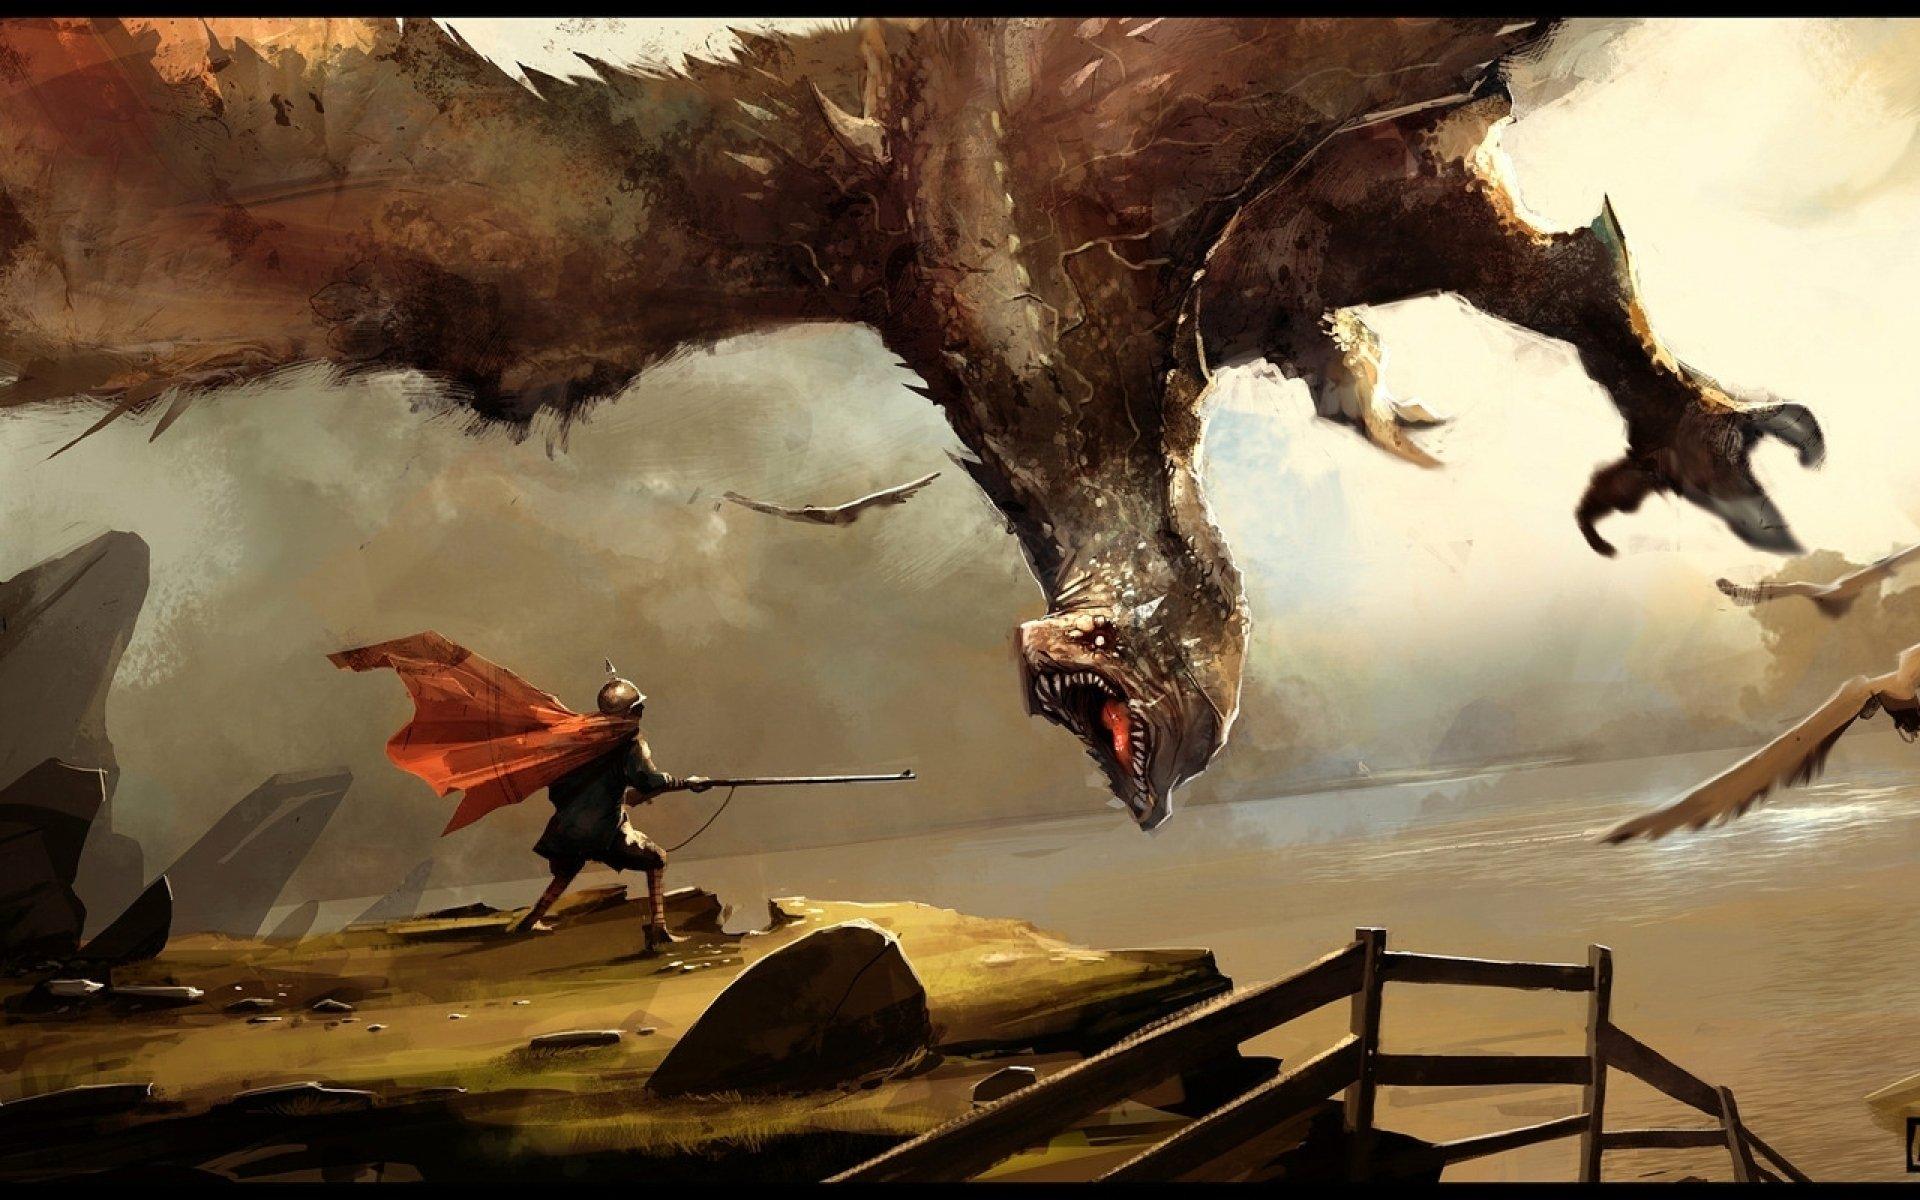 dragons fantasy wallpaper 1920x1200 - photo #32